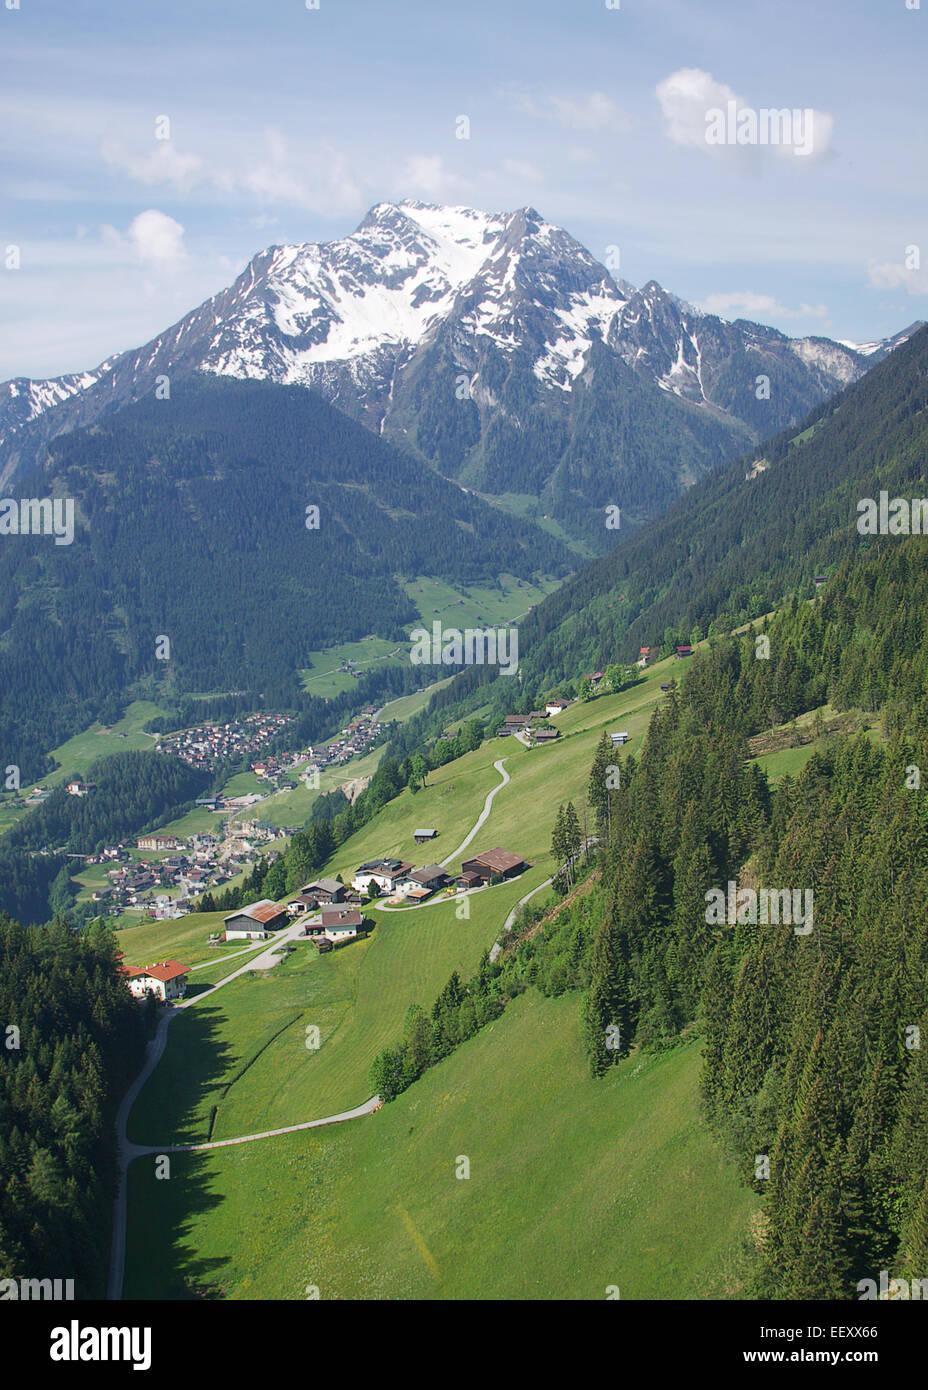 Mountain views - Stock Image